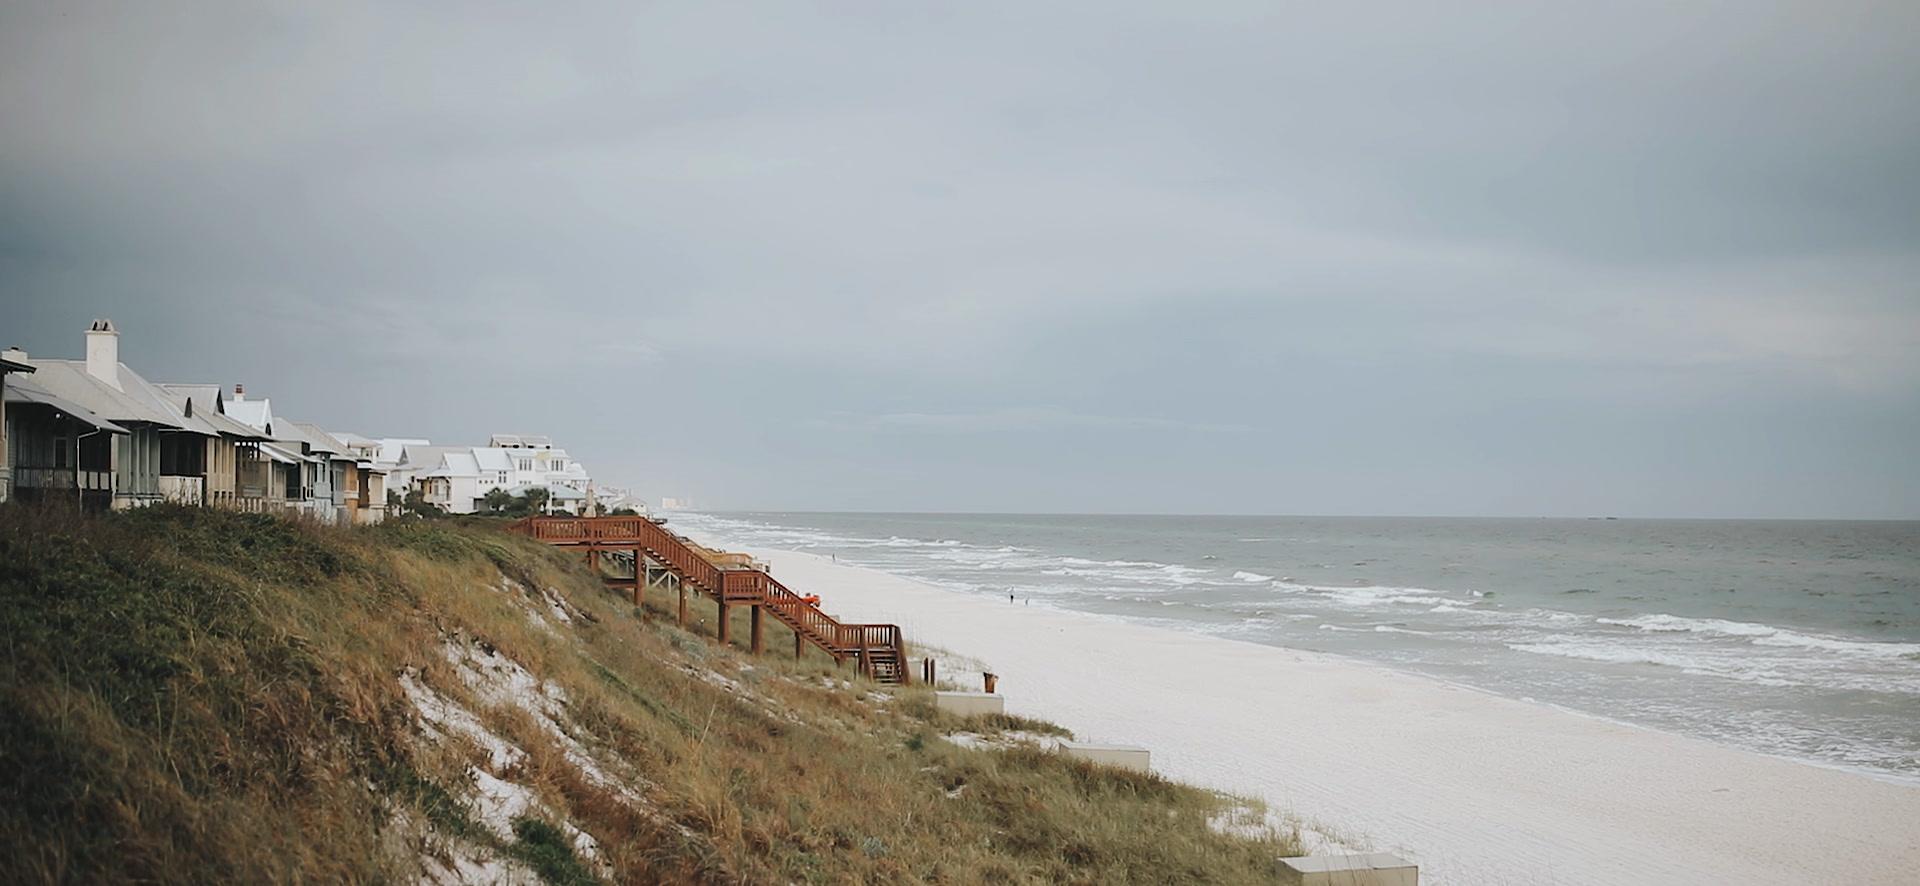 Laura + Jay | Florida, Florida | Rosemary Beach